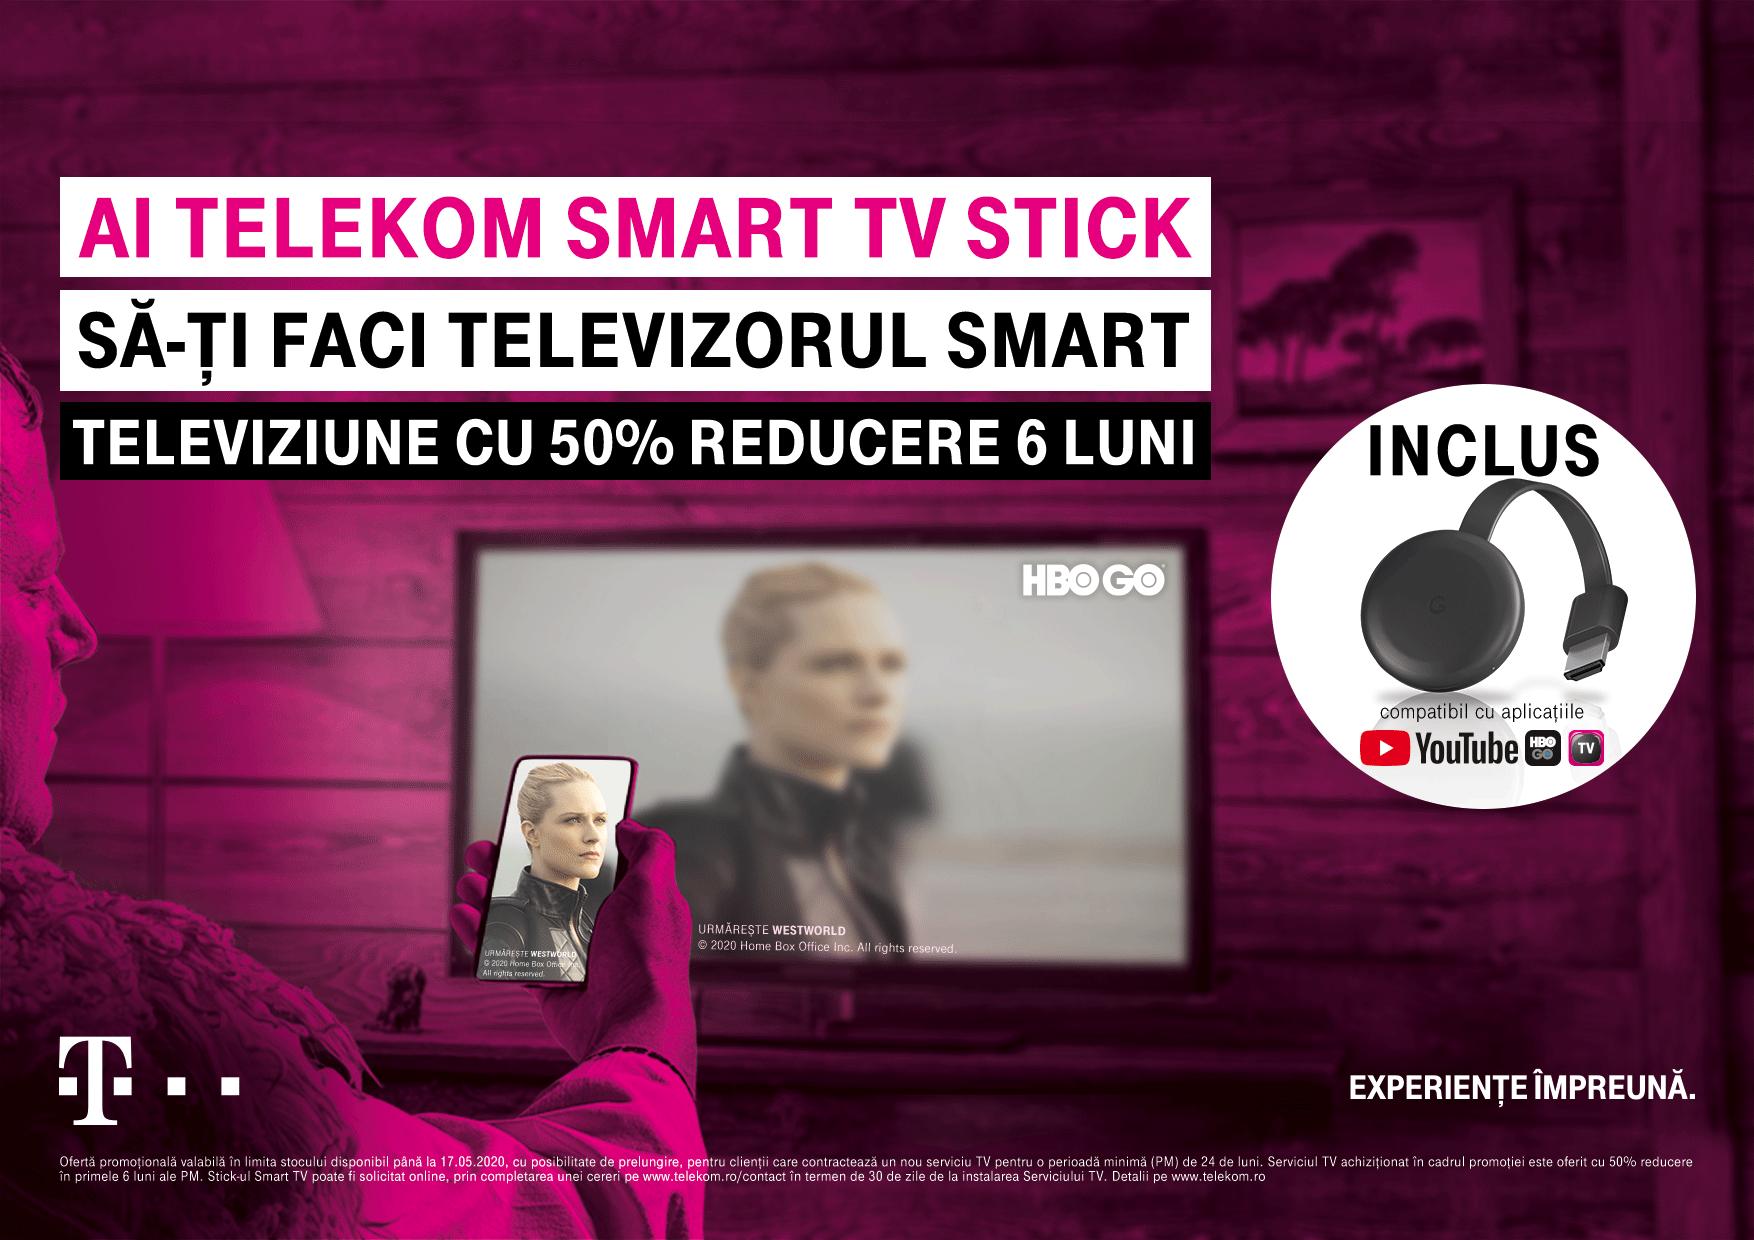 Telekom Entertain Smart Tv